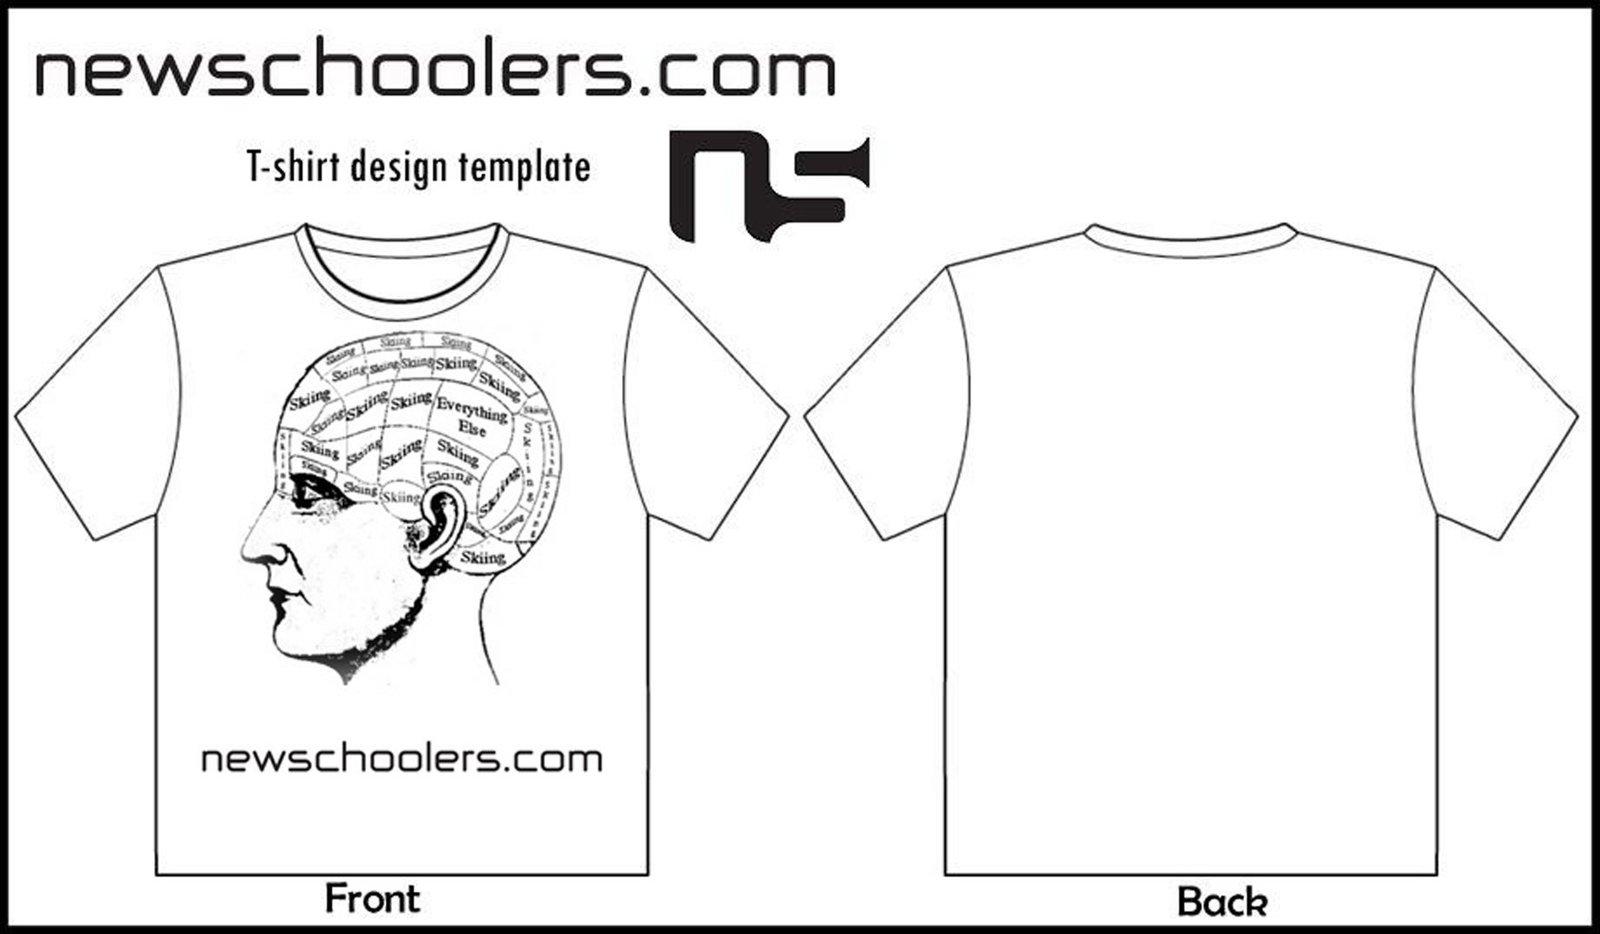 My t shirt design